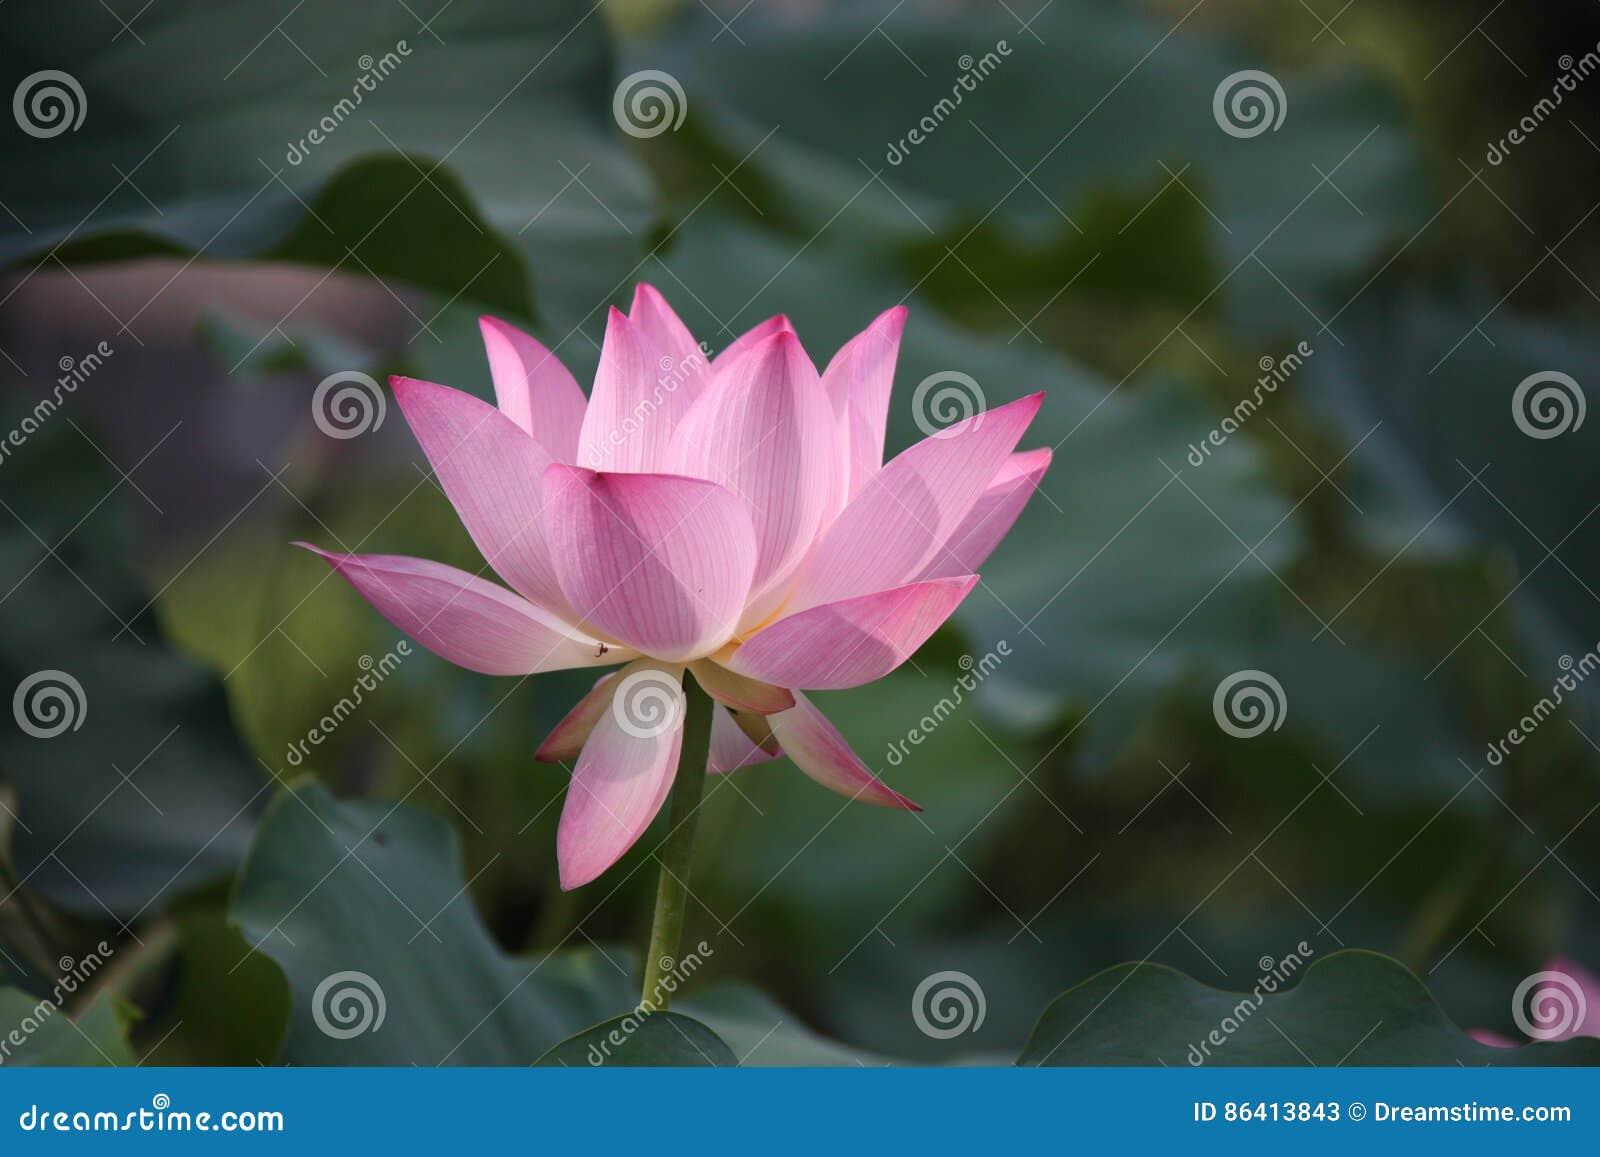 Lotus flower pink lily water nature lotus root stock image lotus flower pink lily water nature lotus root izmirmasajfo